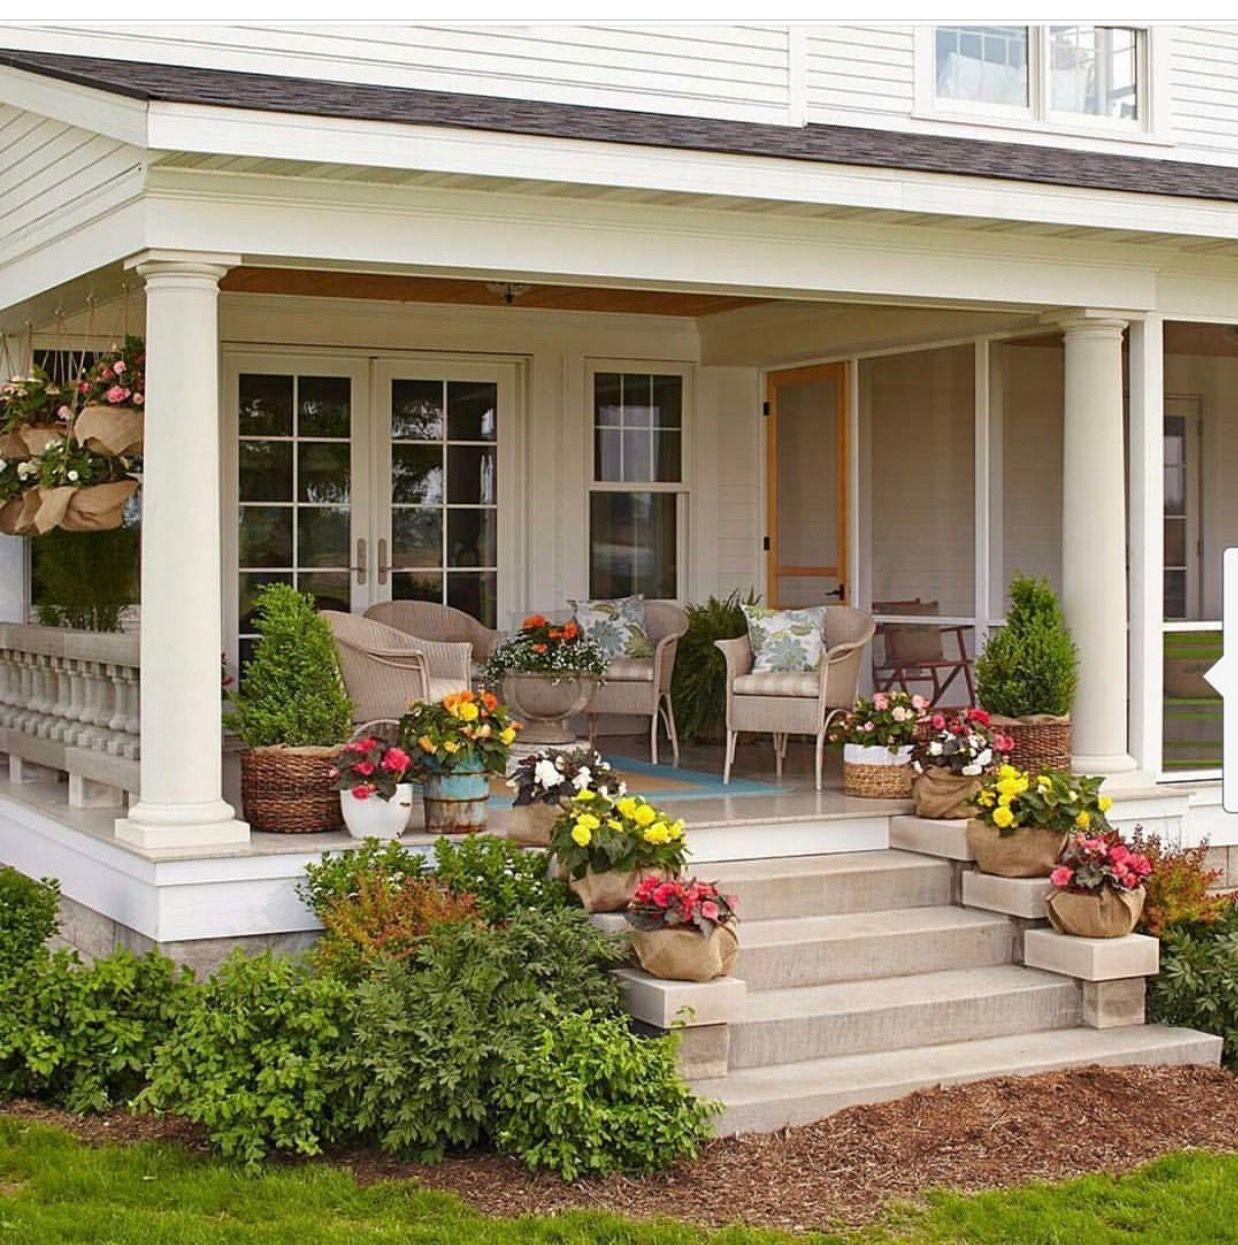 pingl par ana ris sur decor jardins varandas e churrasqueiras pinterest terrasses. Black Bedroom Furniture Sets. Home Design Ideas